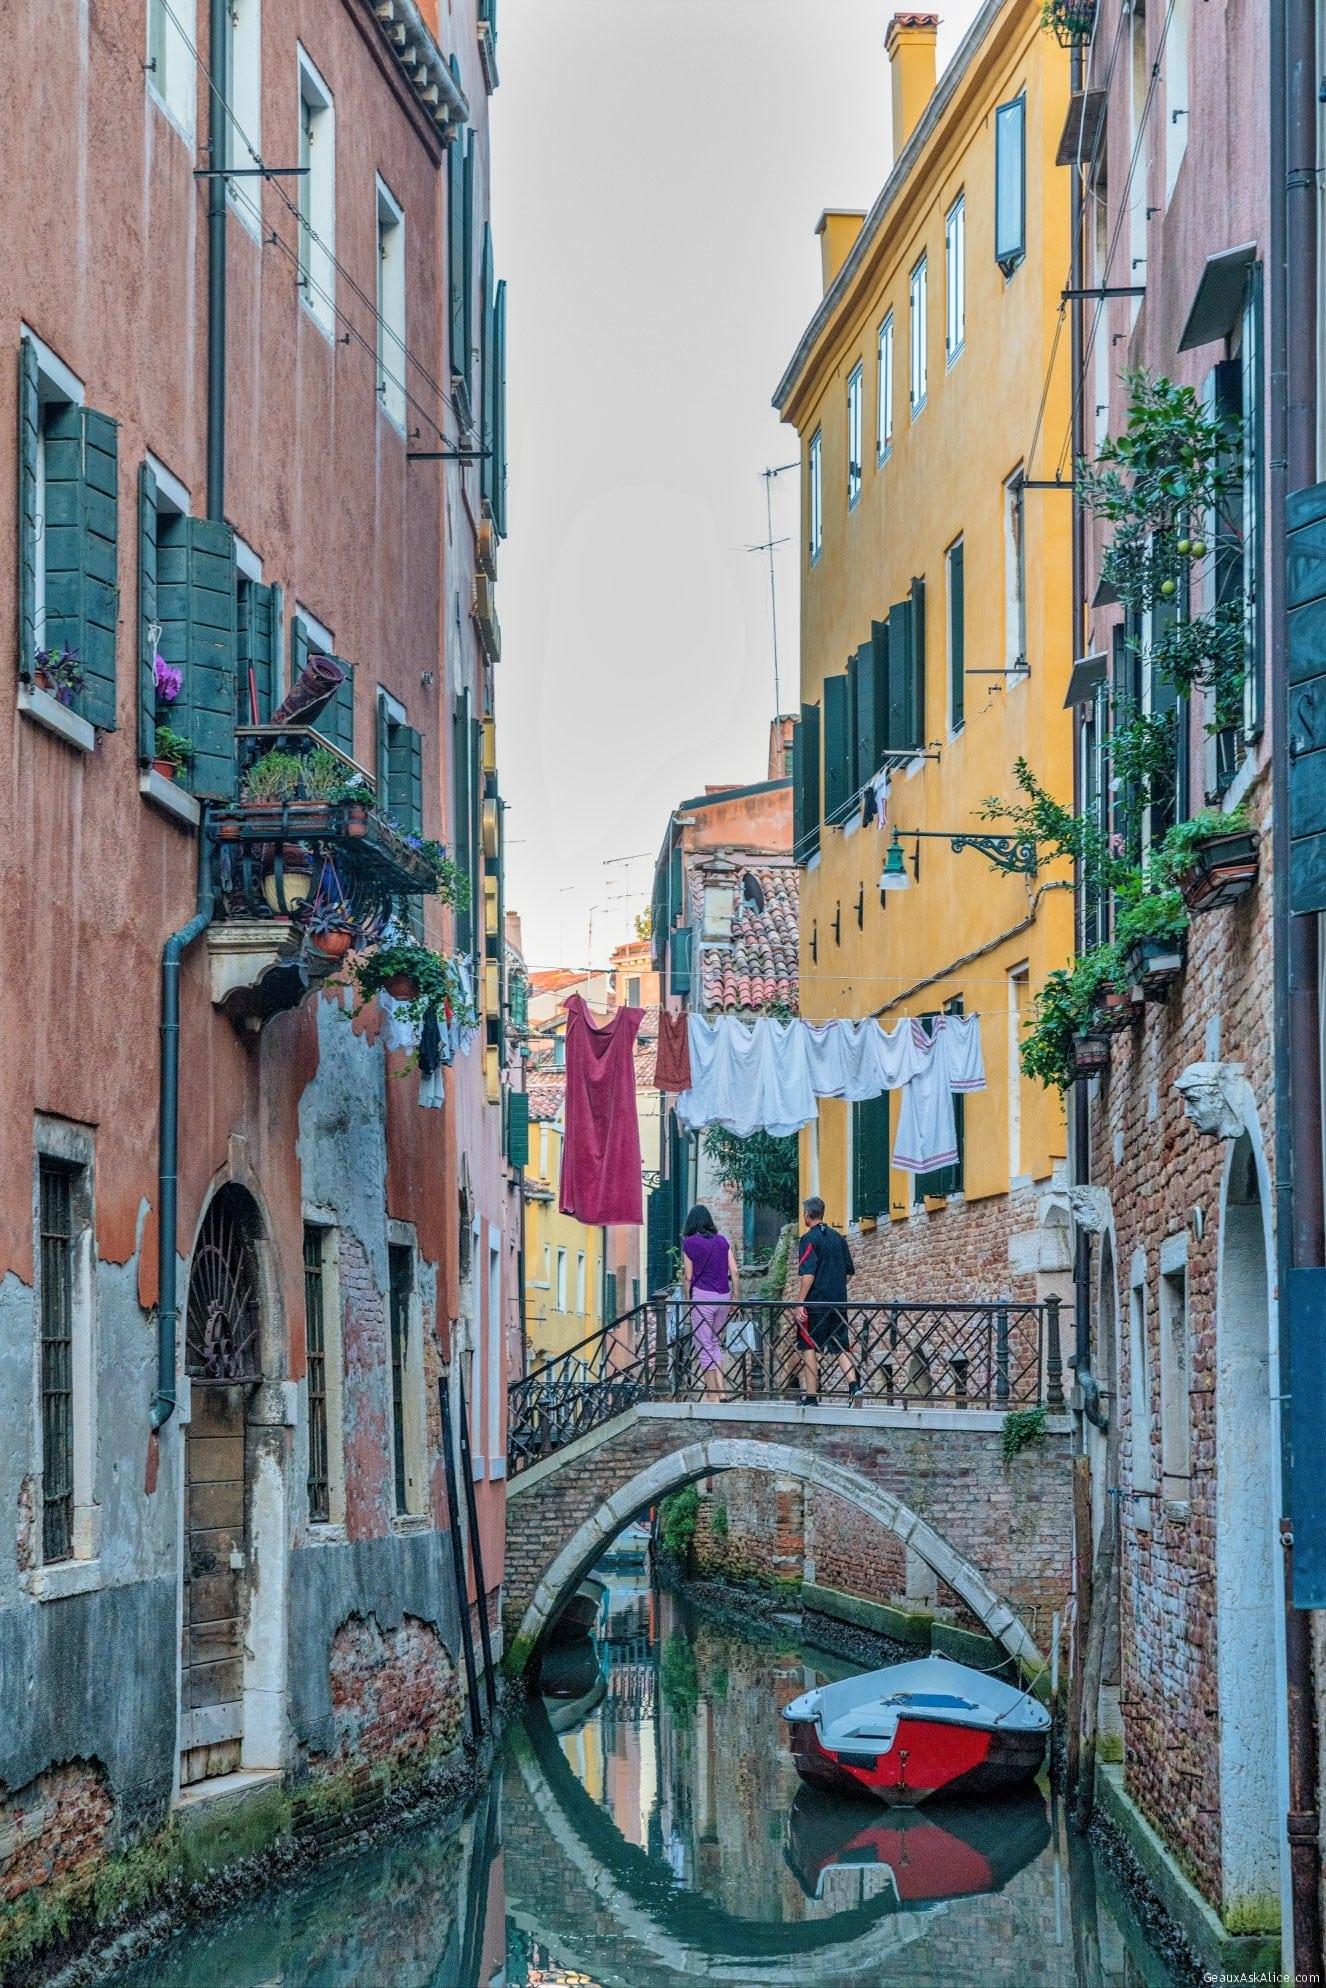 Second Day In Venice!